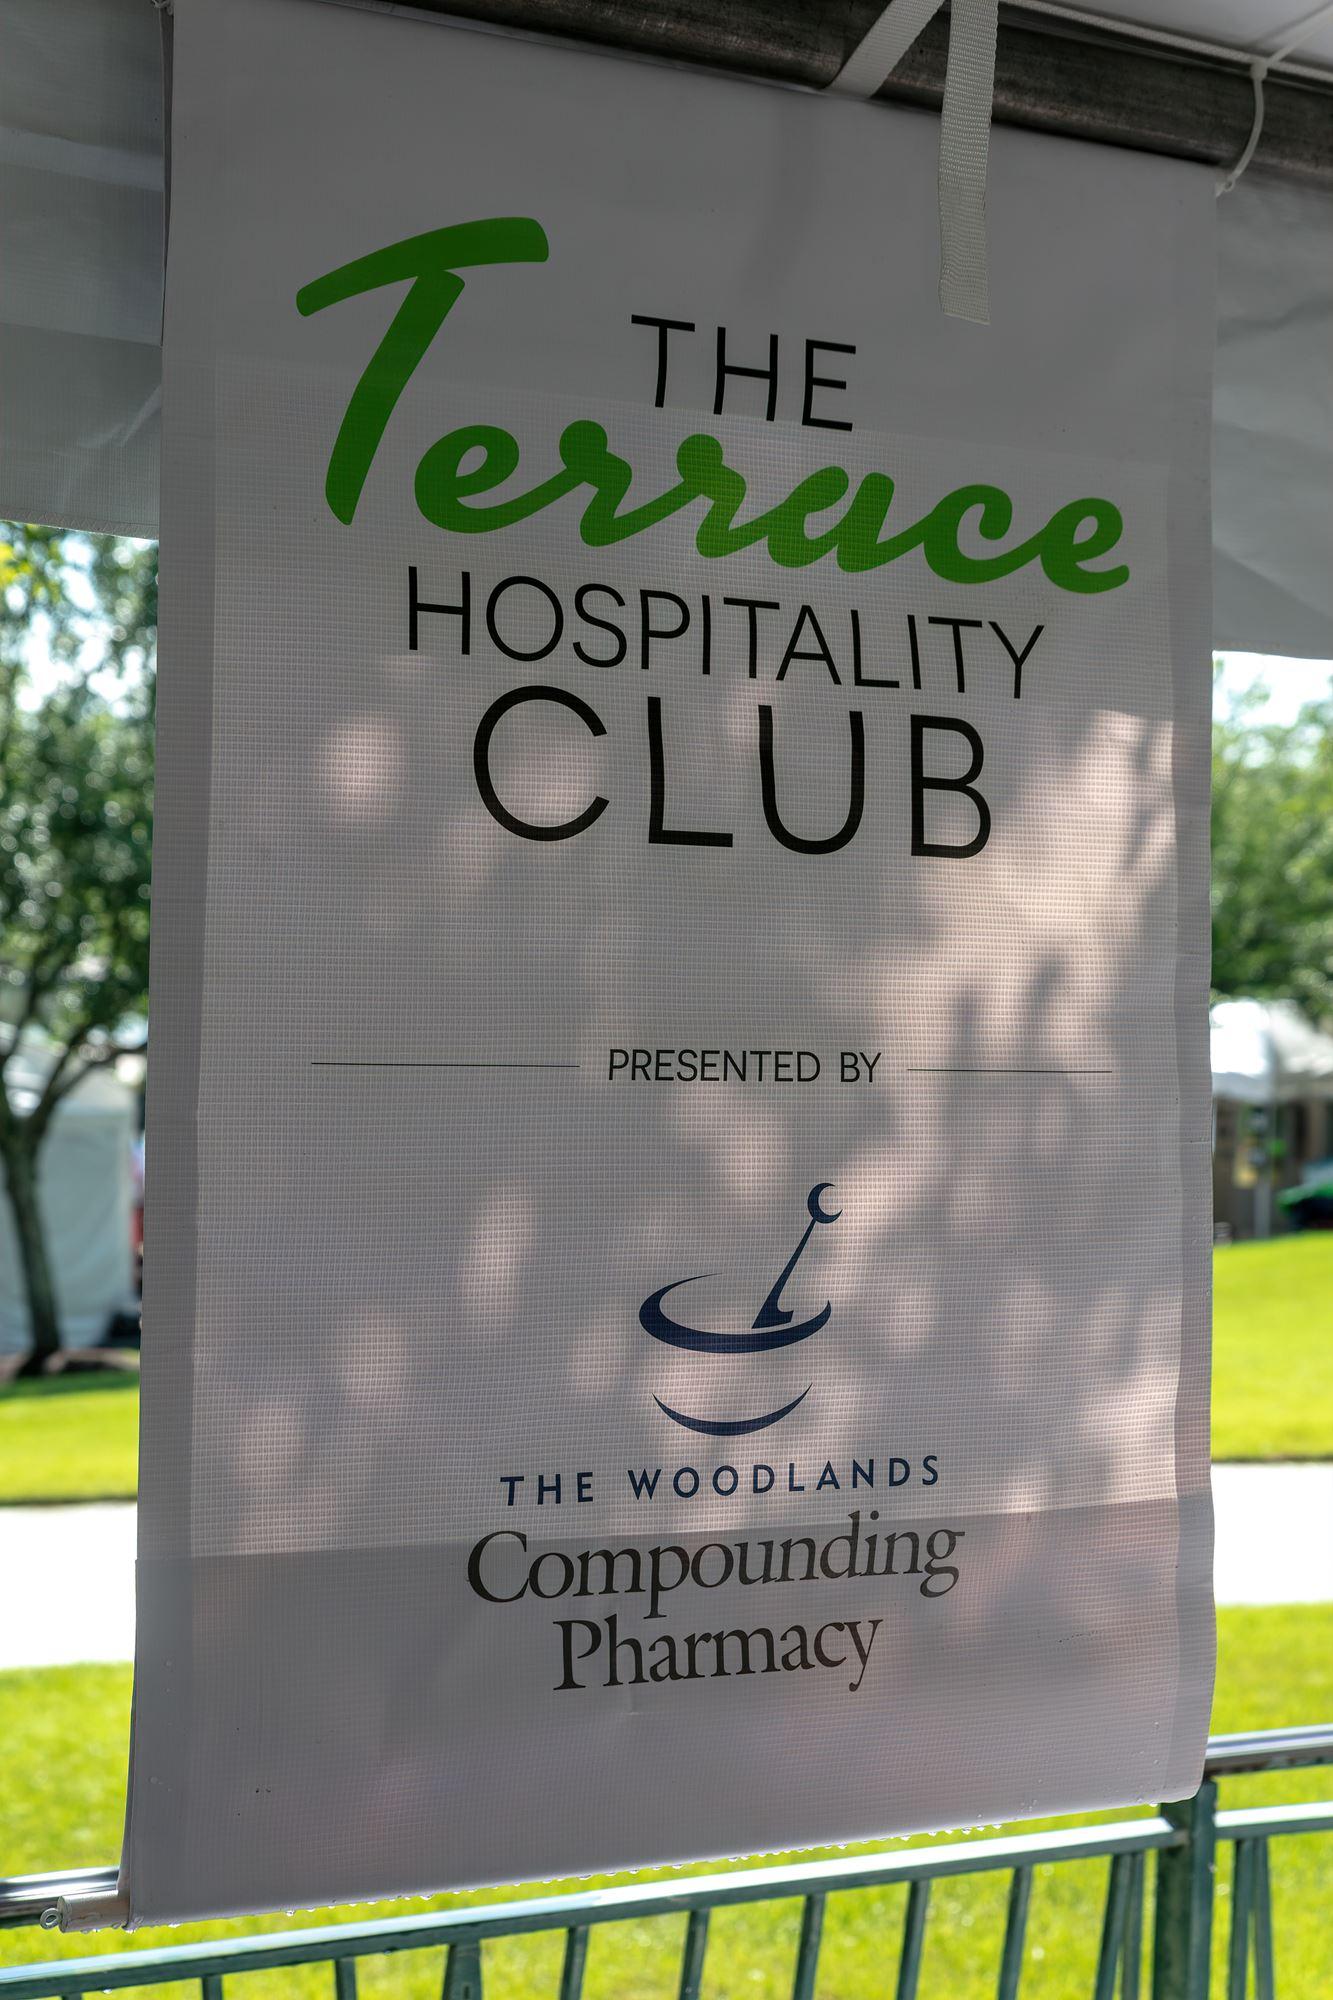 The Terrace Hospitality Club sign